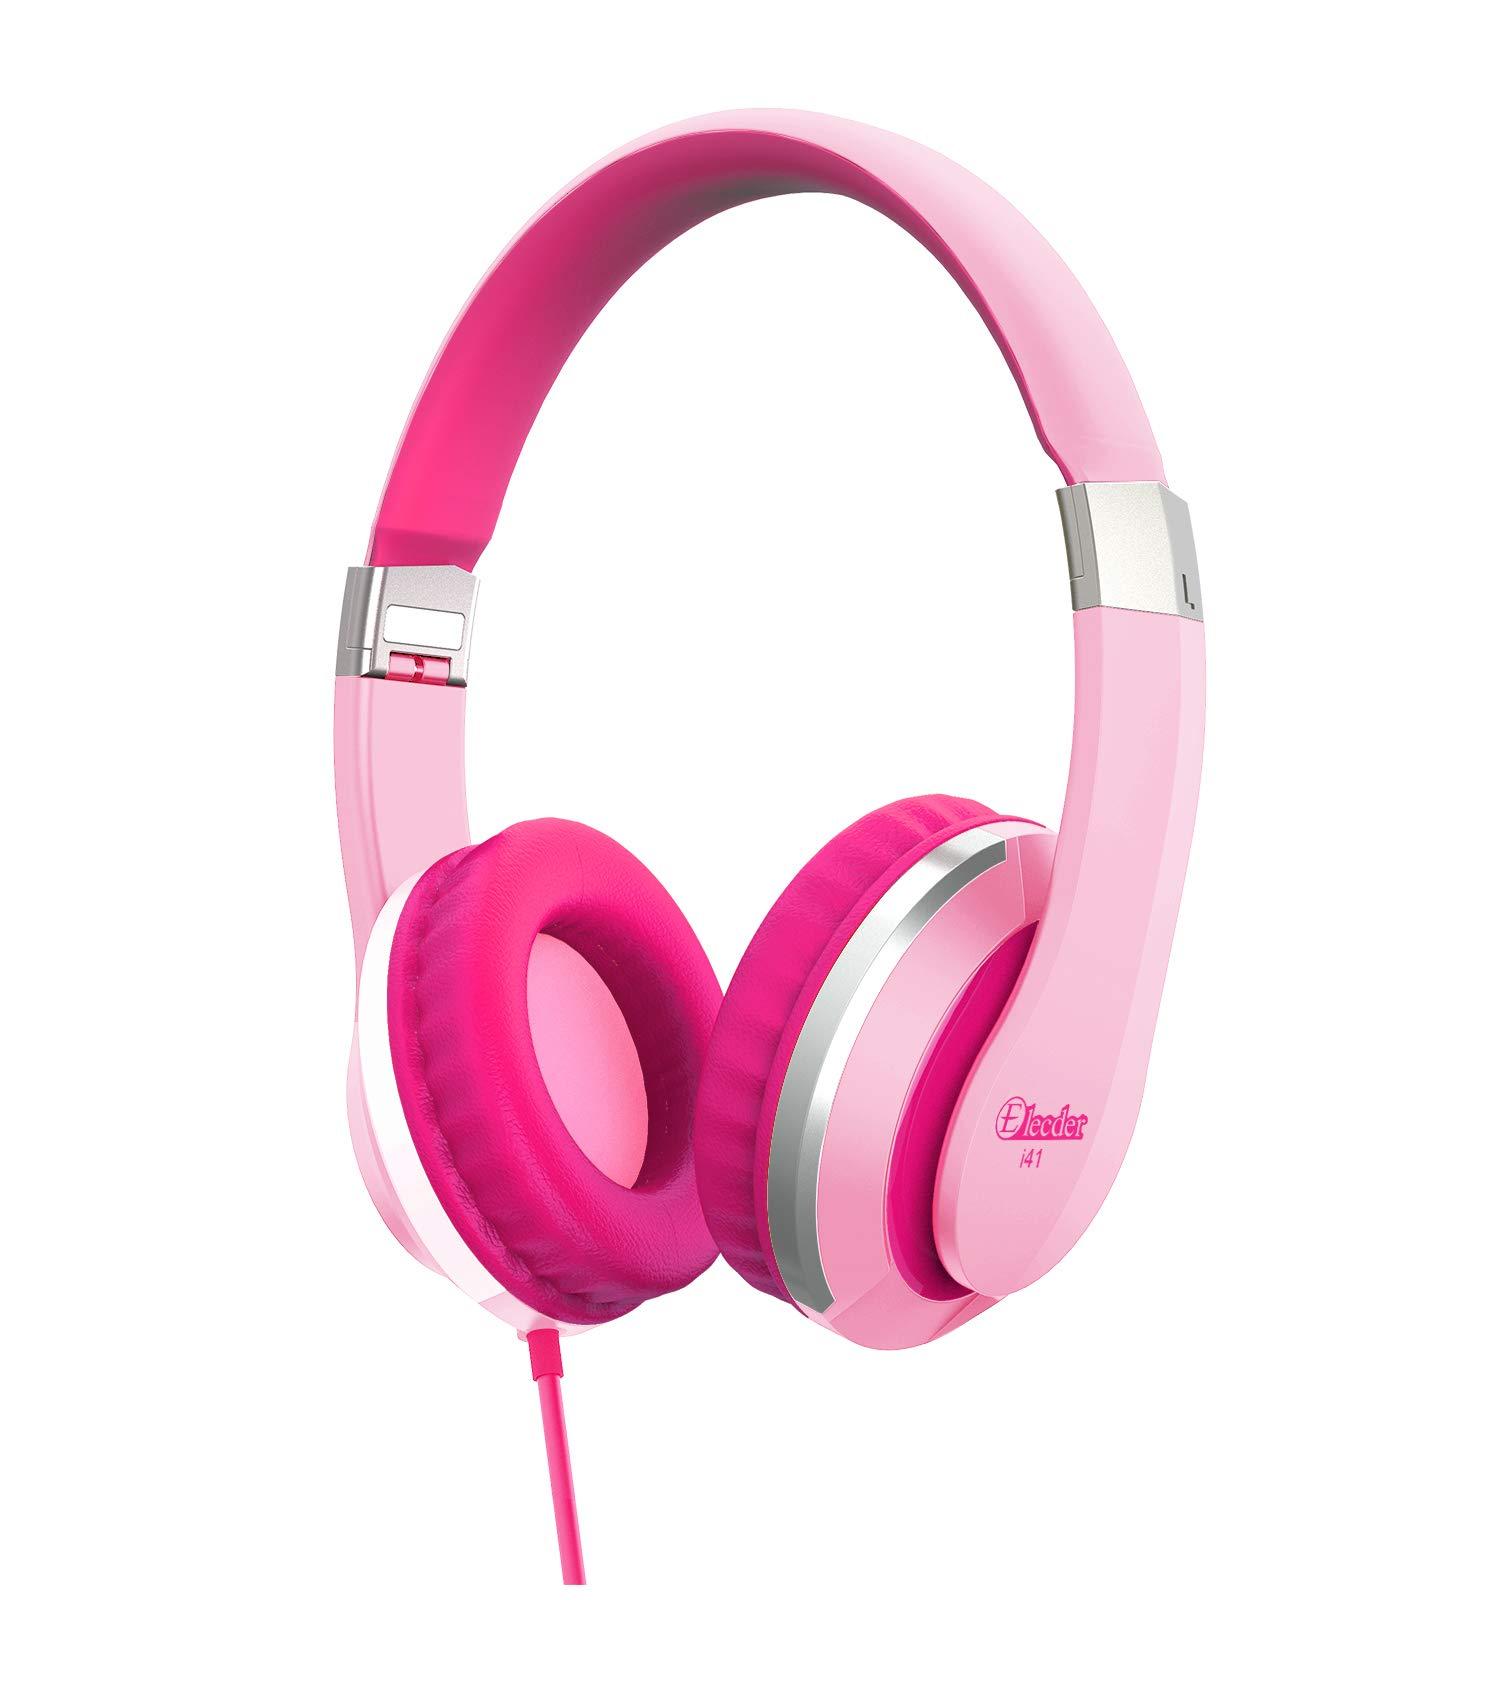 Elecder i41 Kids Headphones, Headphones for Kids Children Girls Boys Teens Foldable Adjustable On Ear Headphones with 3.5mm Jack for iPad Cellphones Computer MP3/4 Kindle Airplane School Pink/Purple